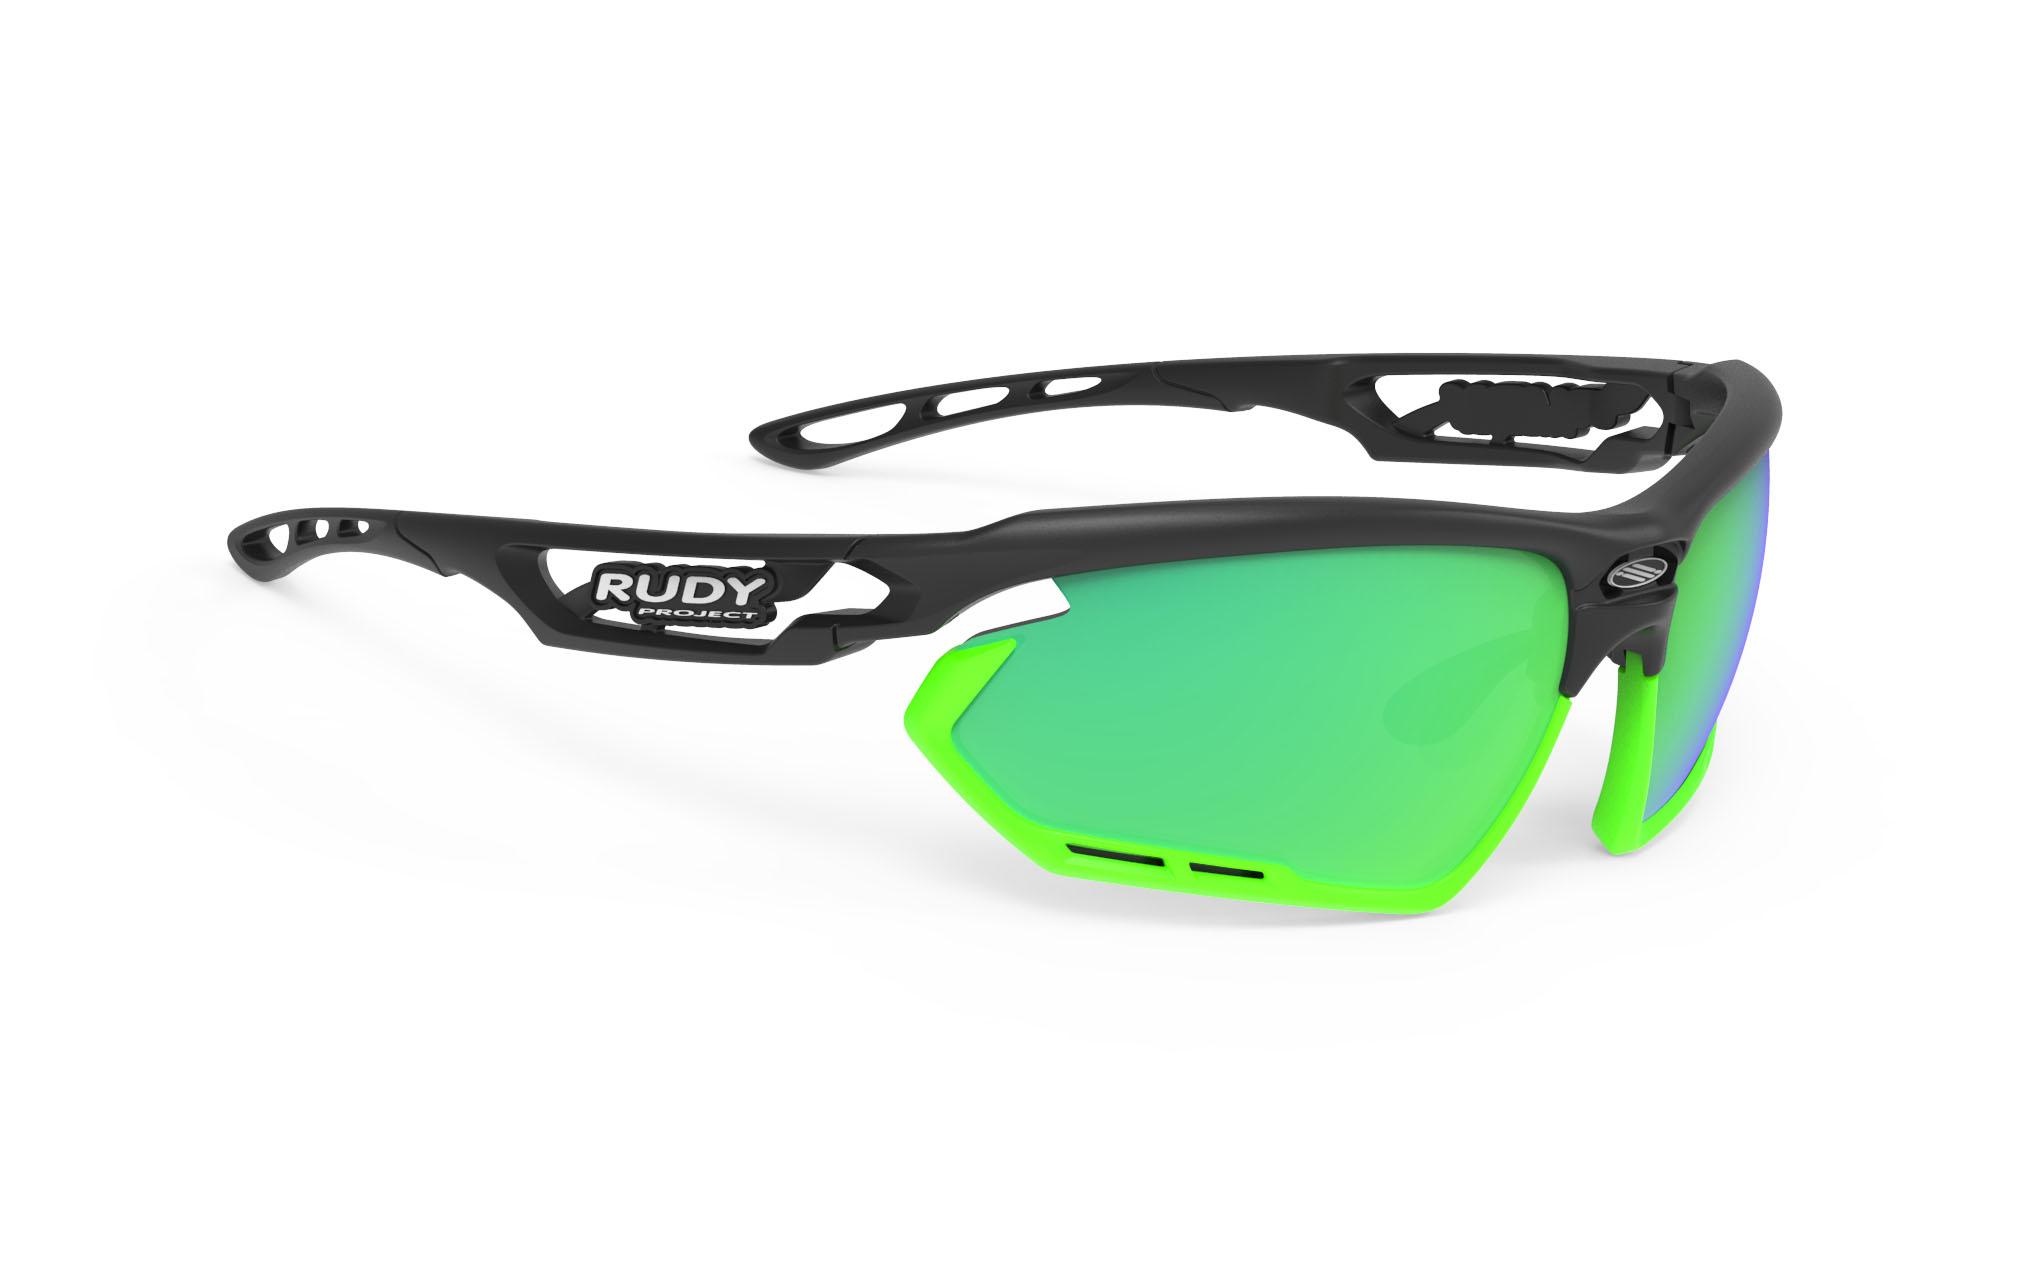 Fotonyk Matte Black Lime - Polar 3FX HDR Multilaser Green